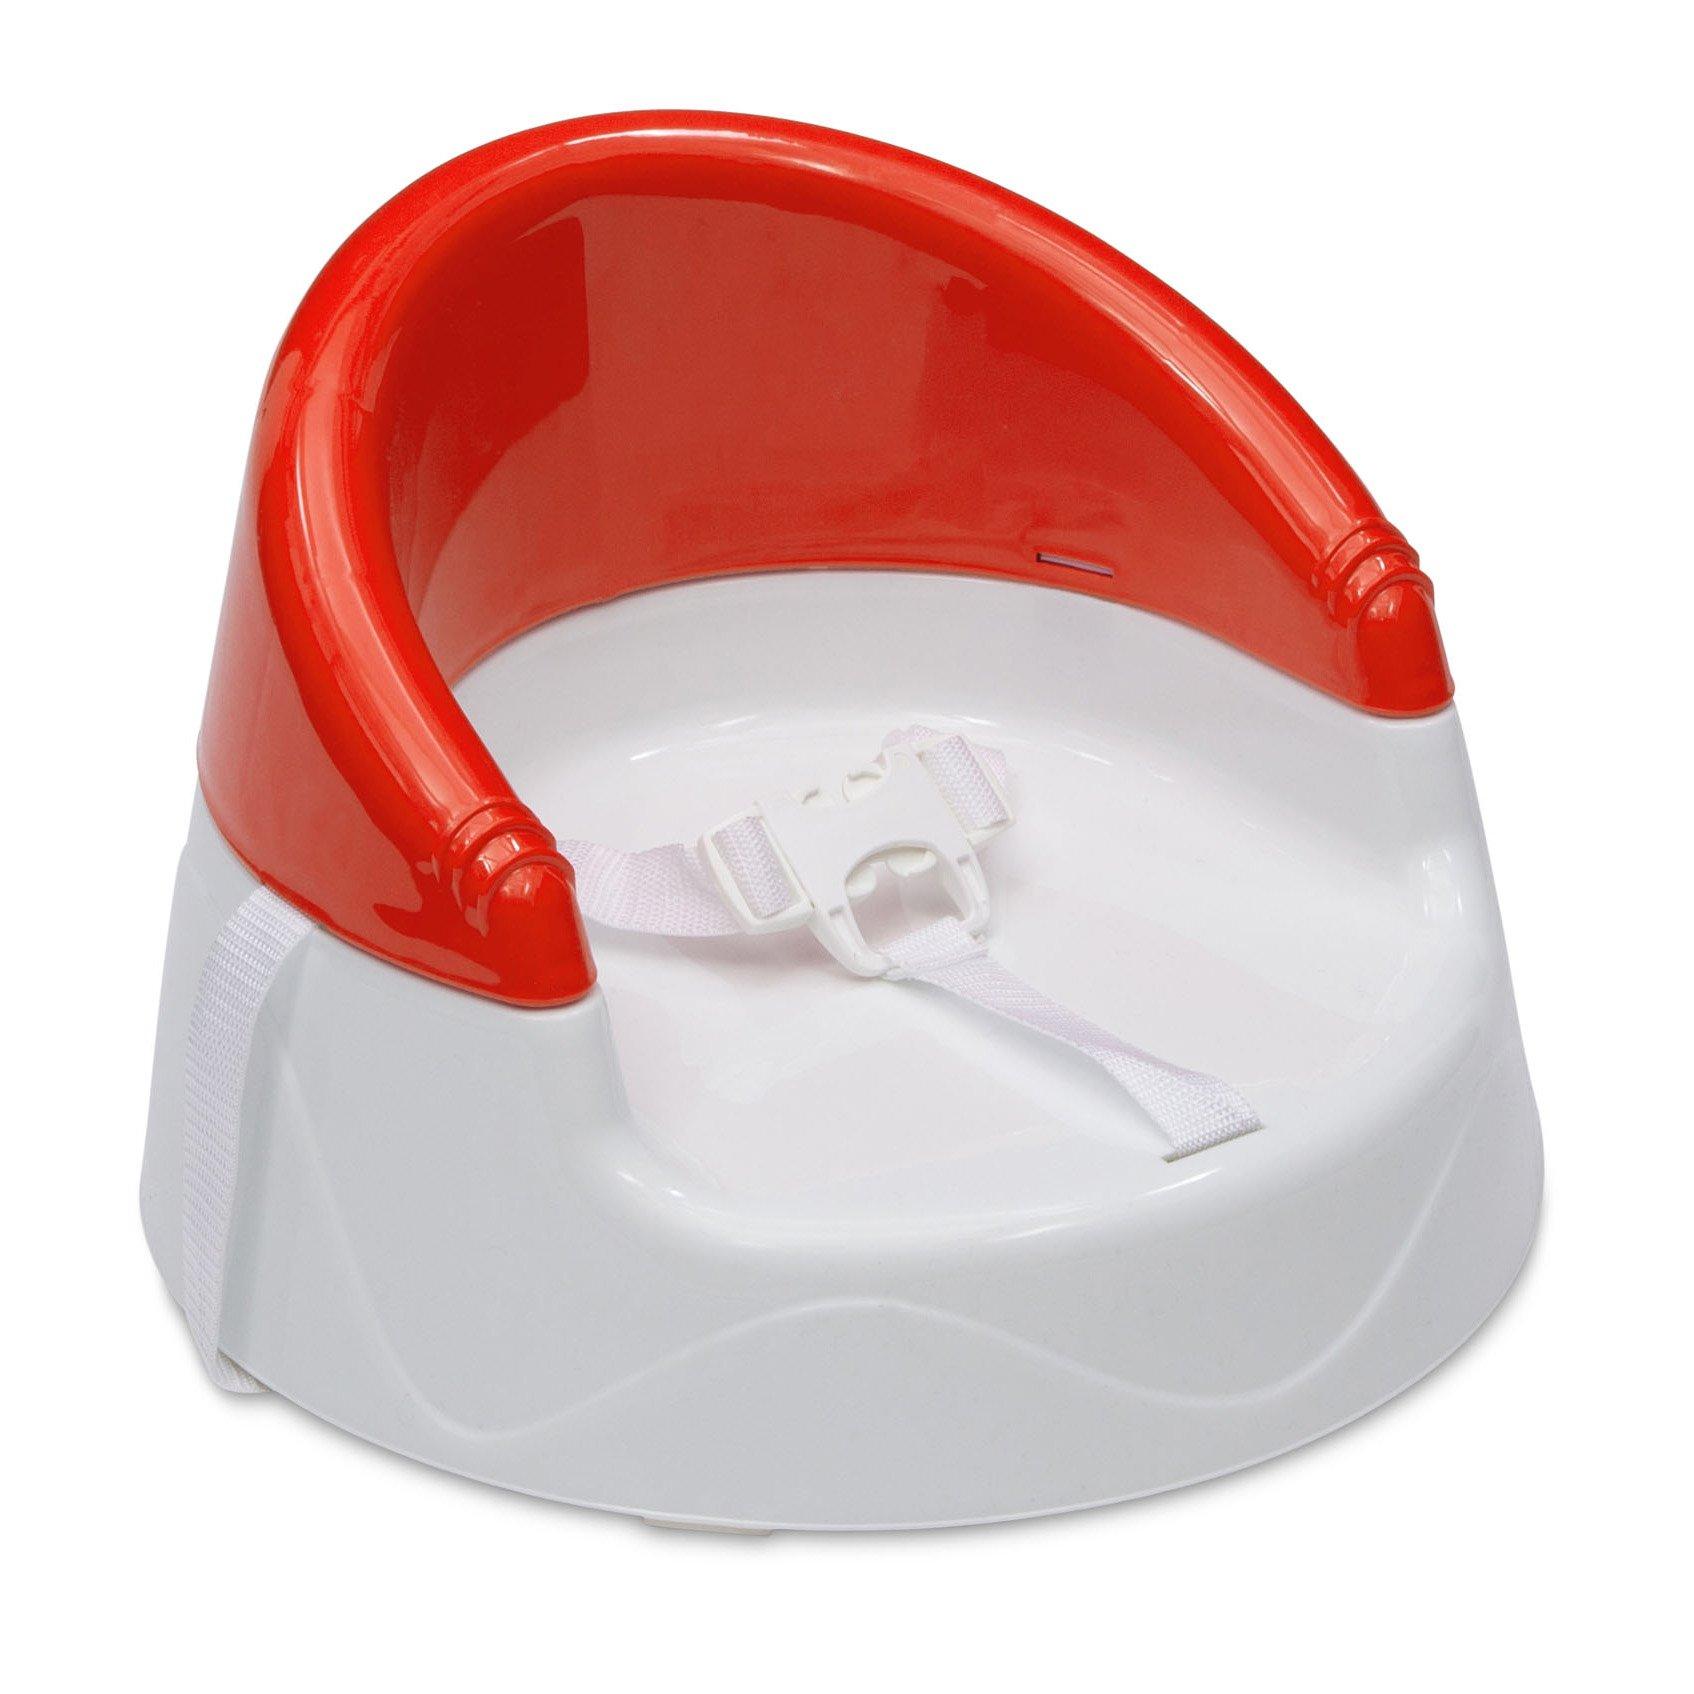 Delta Children Classic Booster Seat, Red